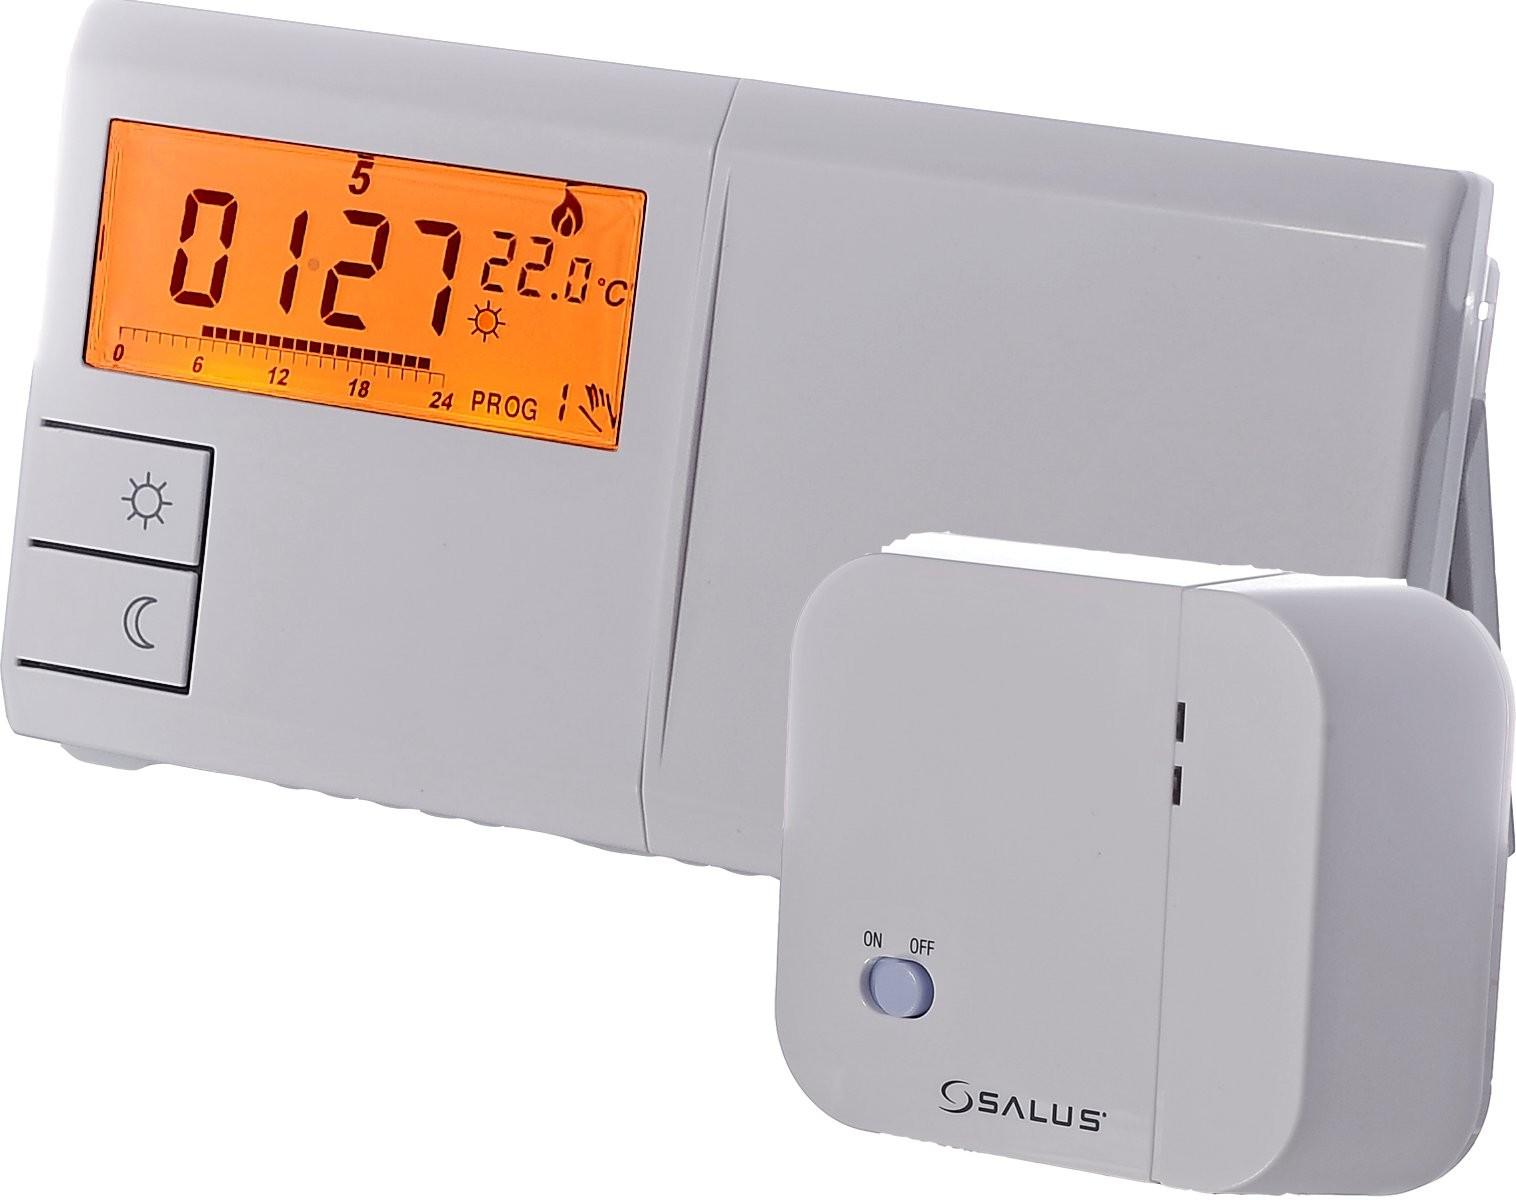 Termostat Salus 091 FLRF